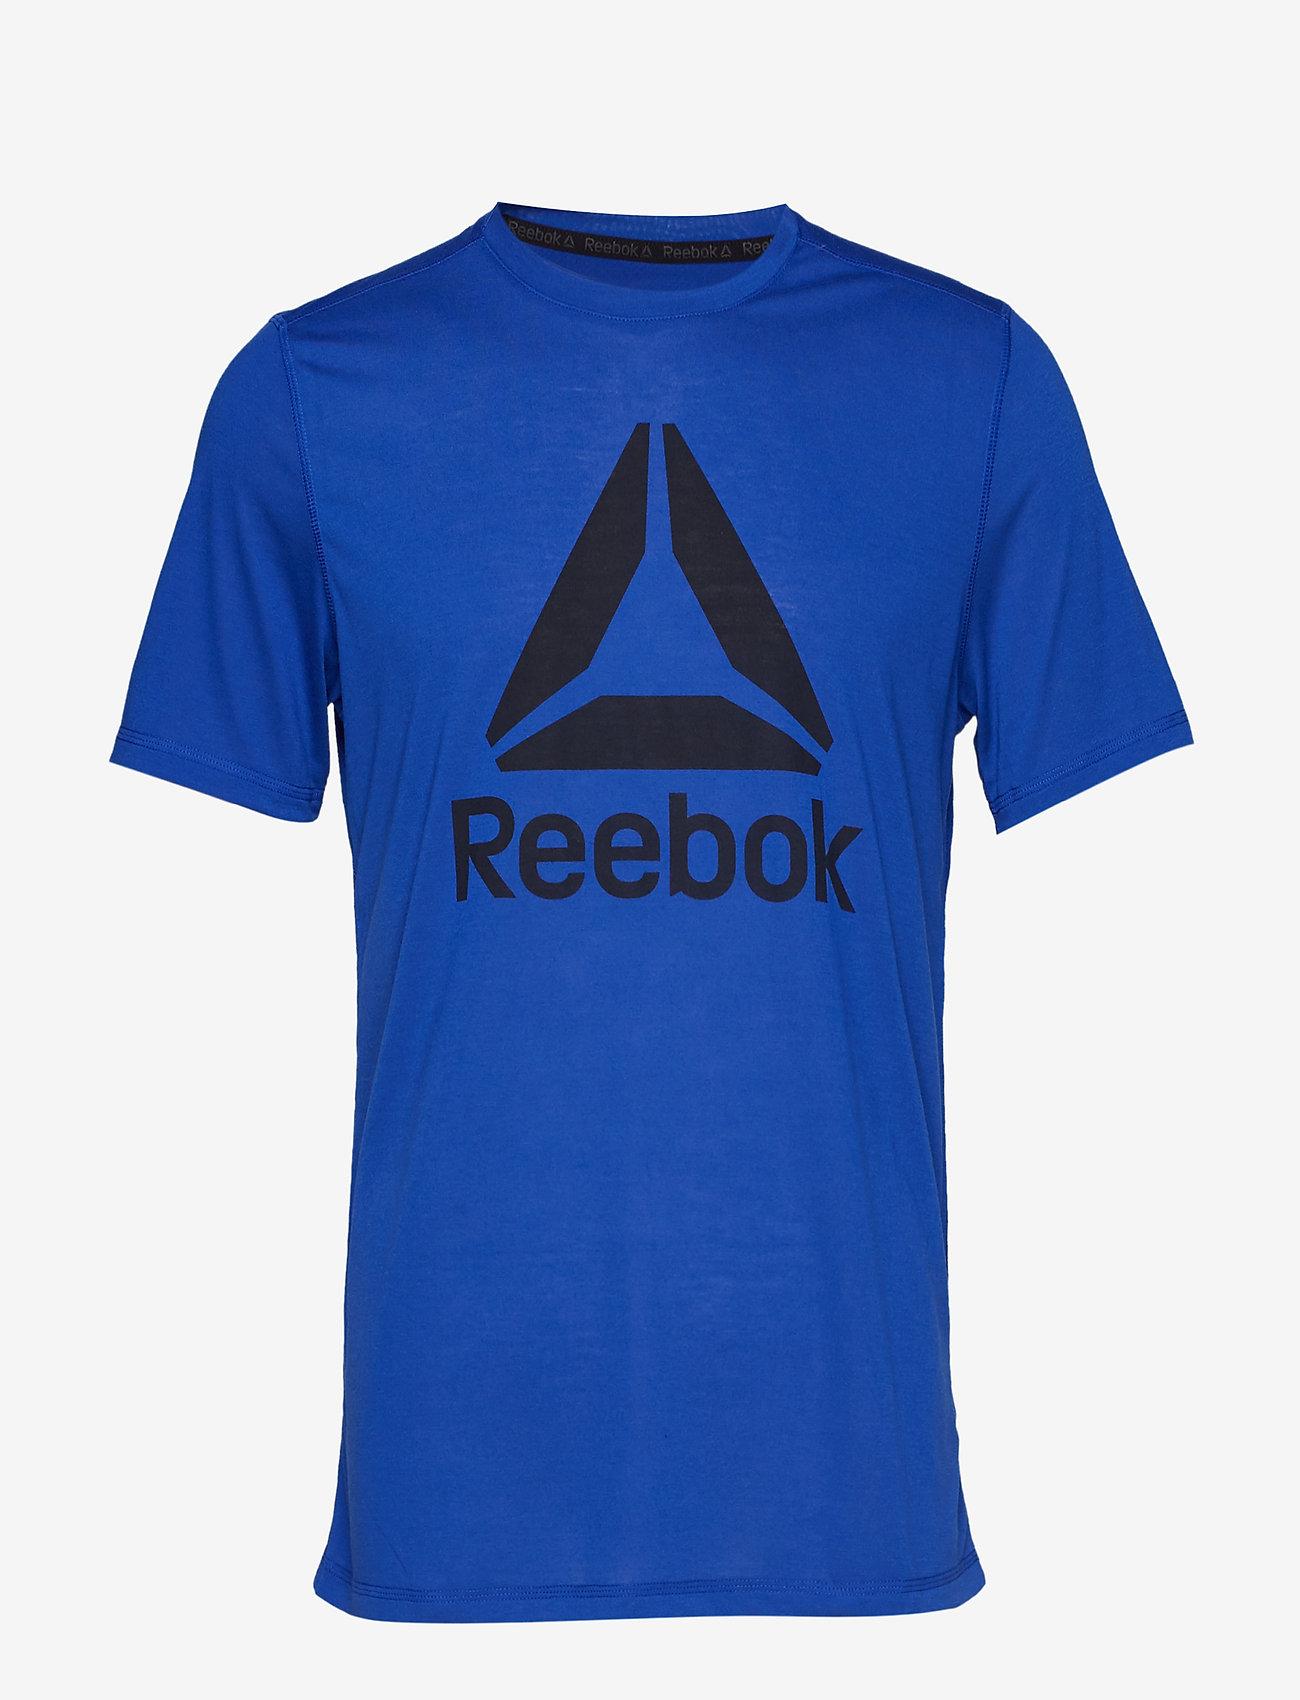 Reebok Performance WOR SUP GRAPHIC SS TEE - T-shirts COBALT QV5S8dDx